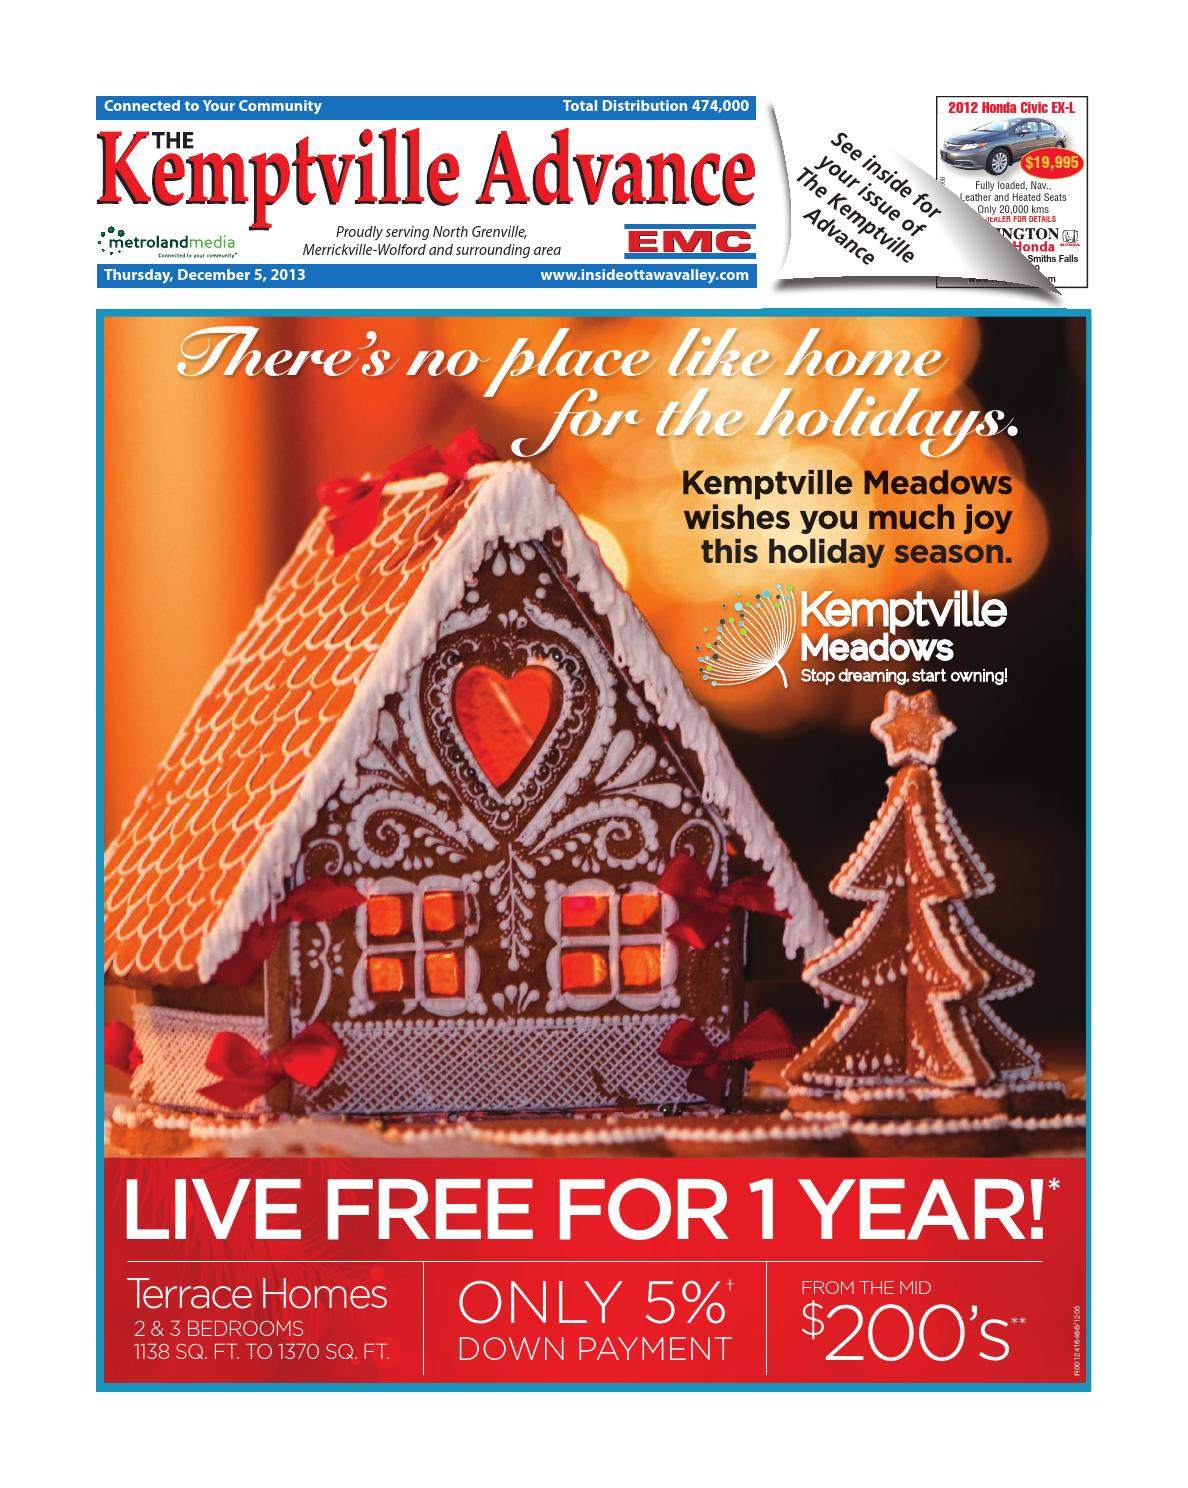 1fa68ba7f7b6 Kemptville120513 by Metroland East - Kemptville Advance - issuu